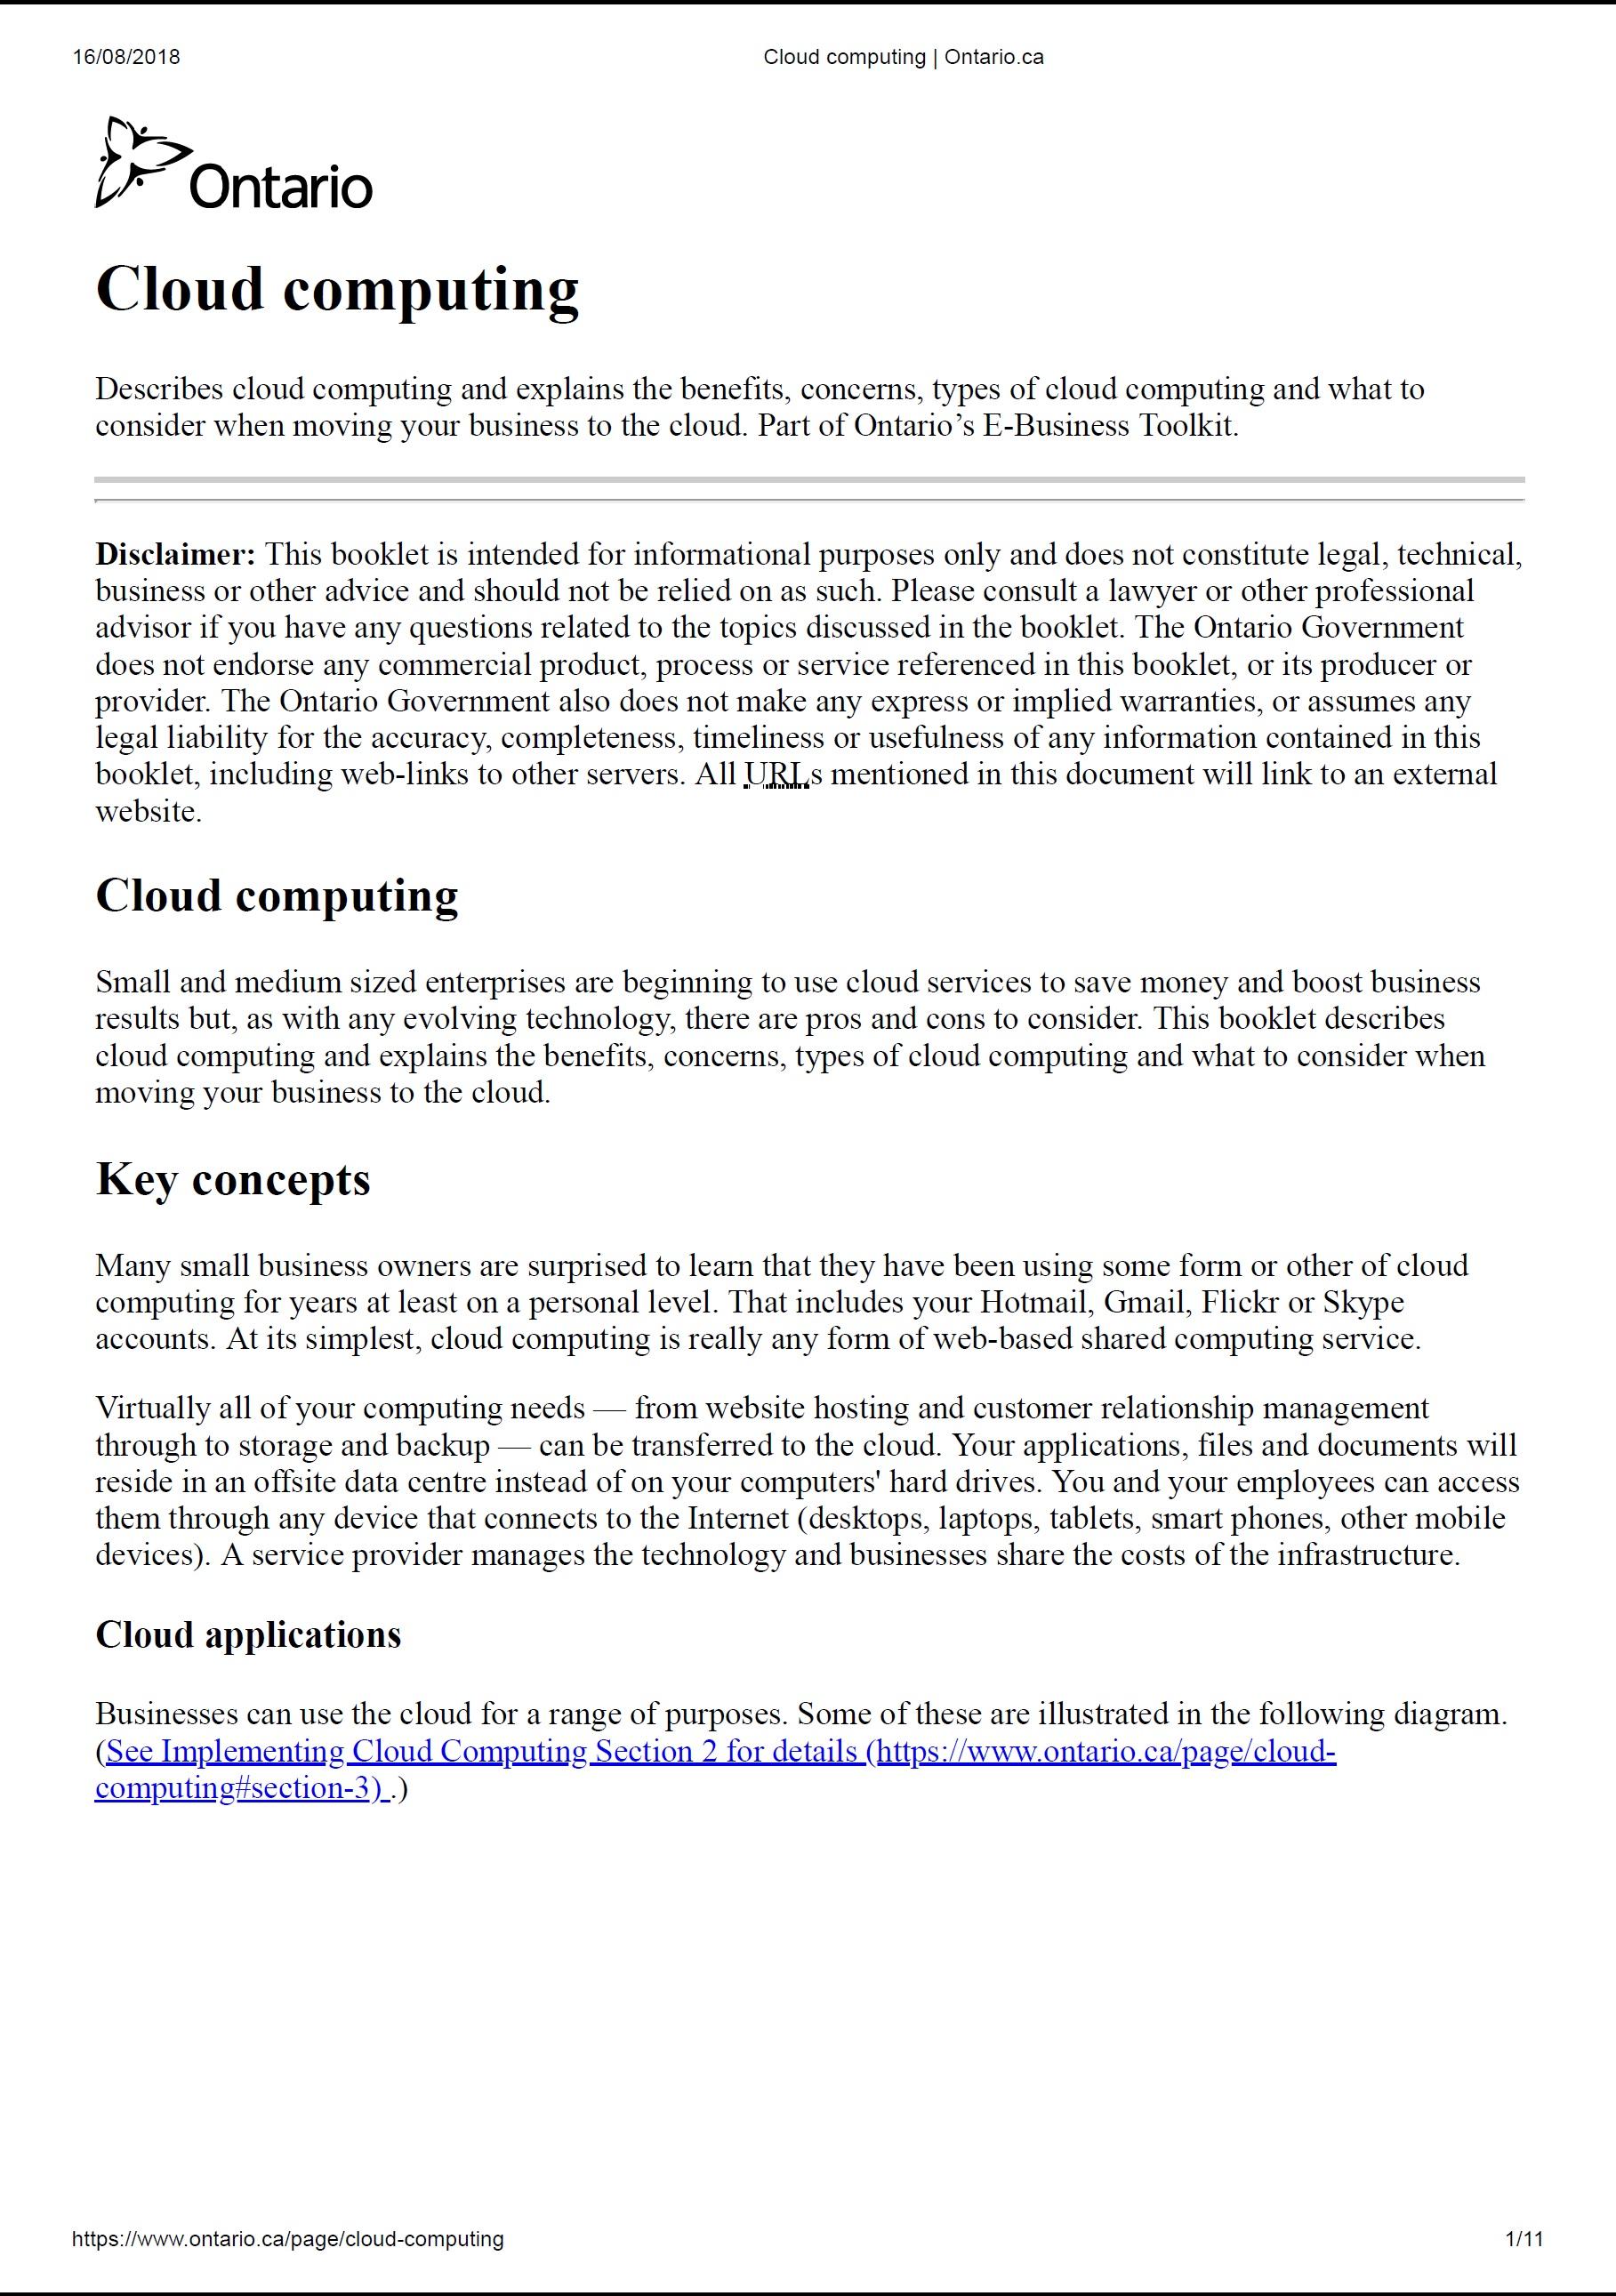 Cloud Computing – Ontario Government